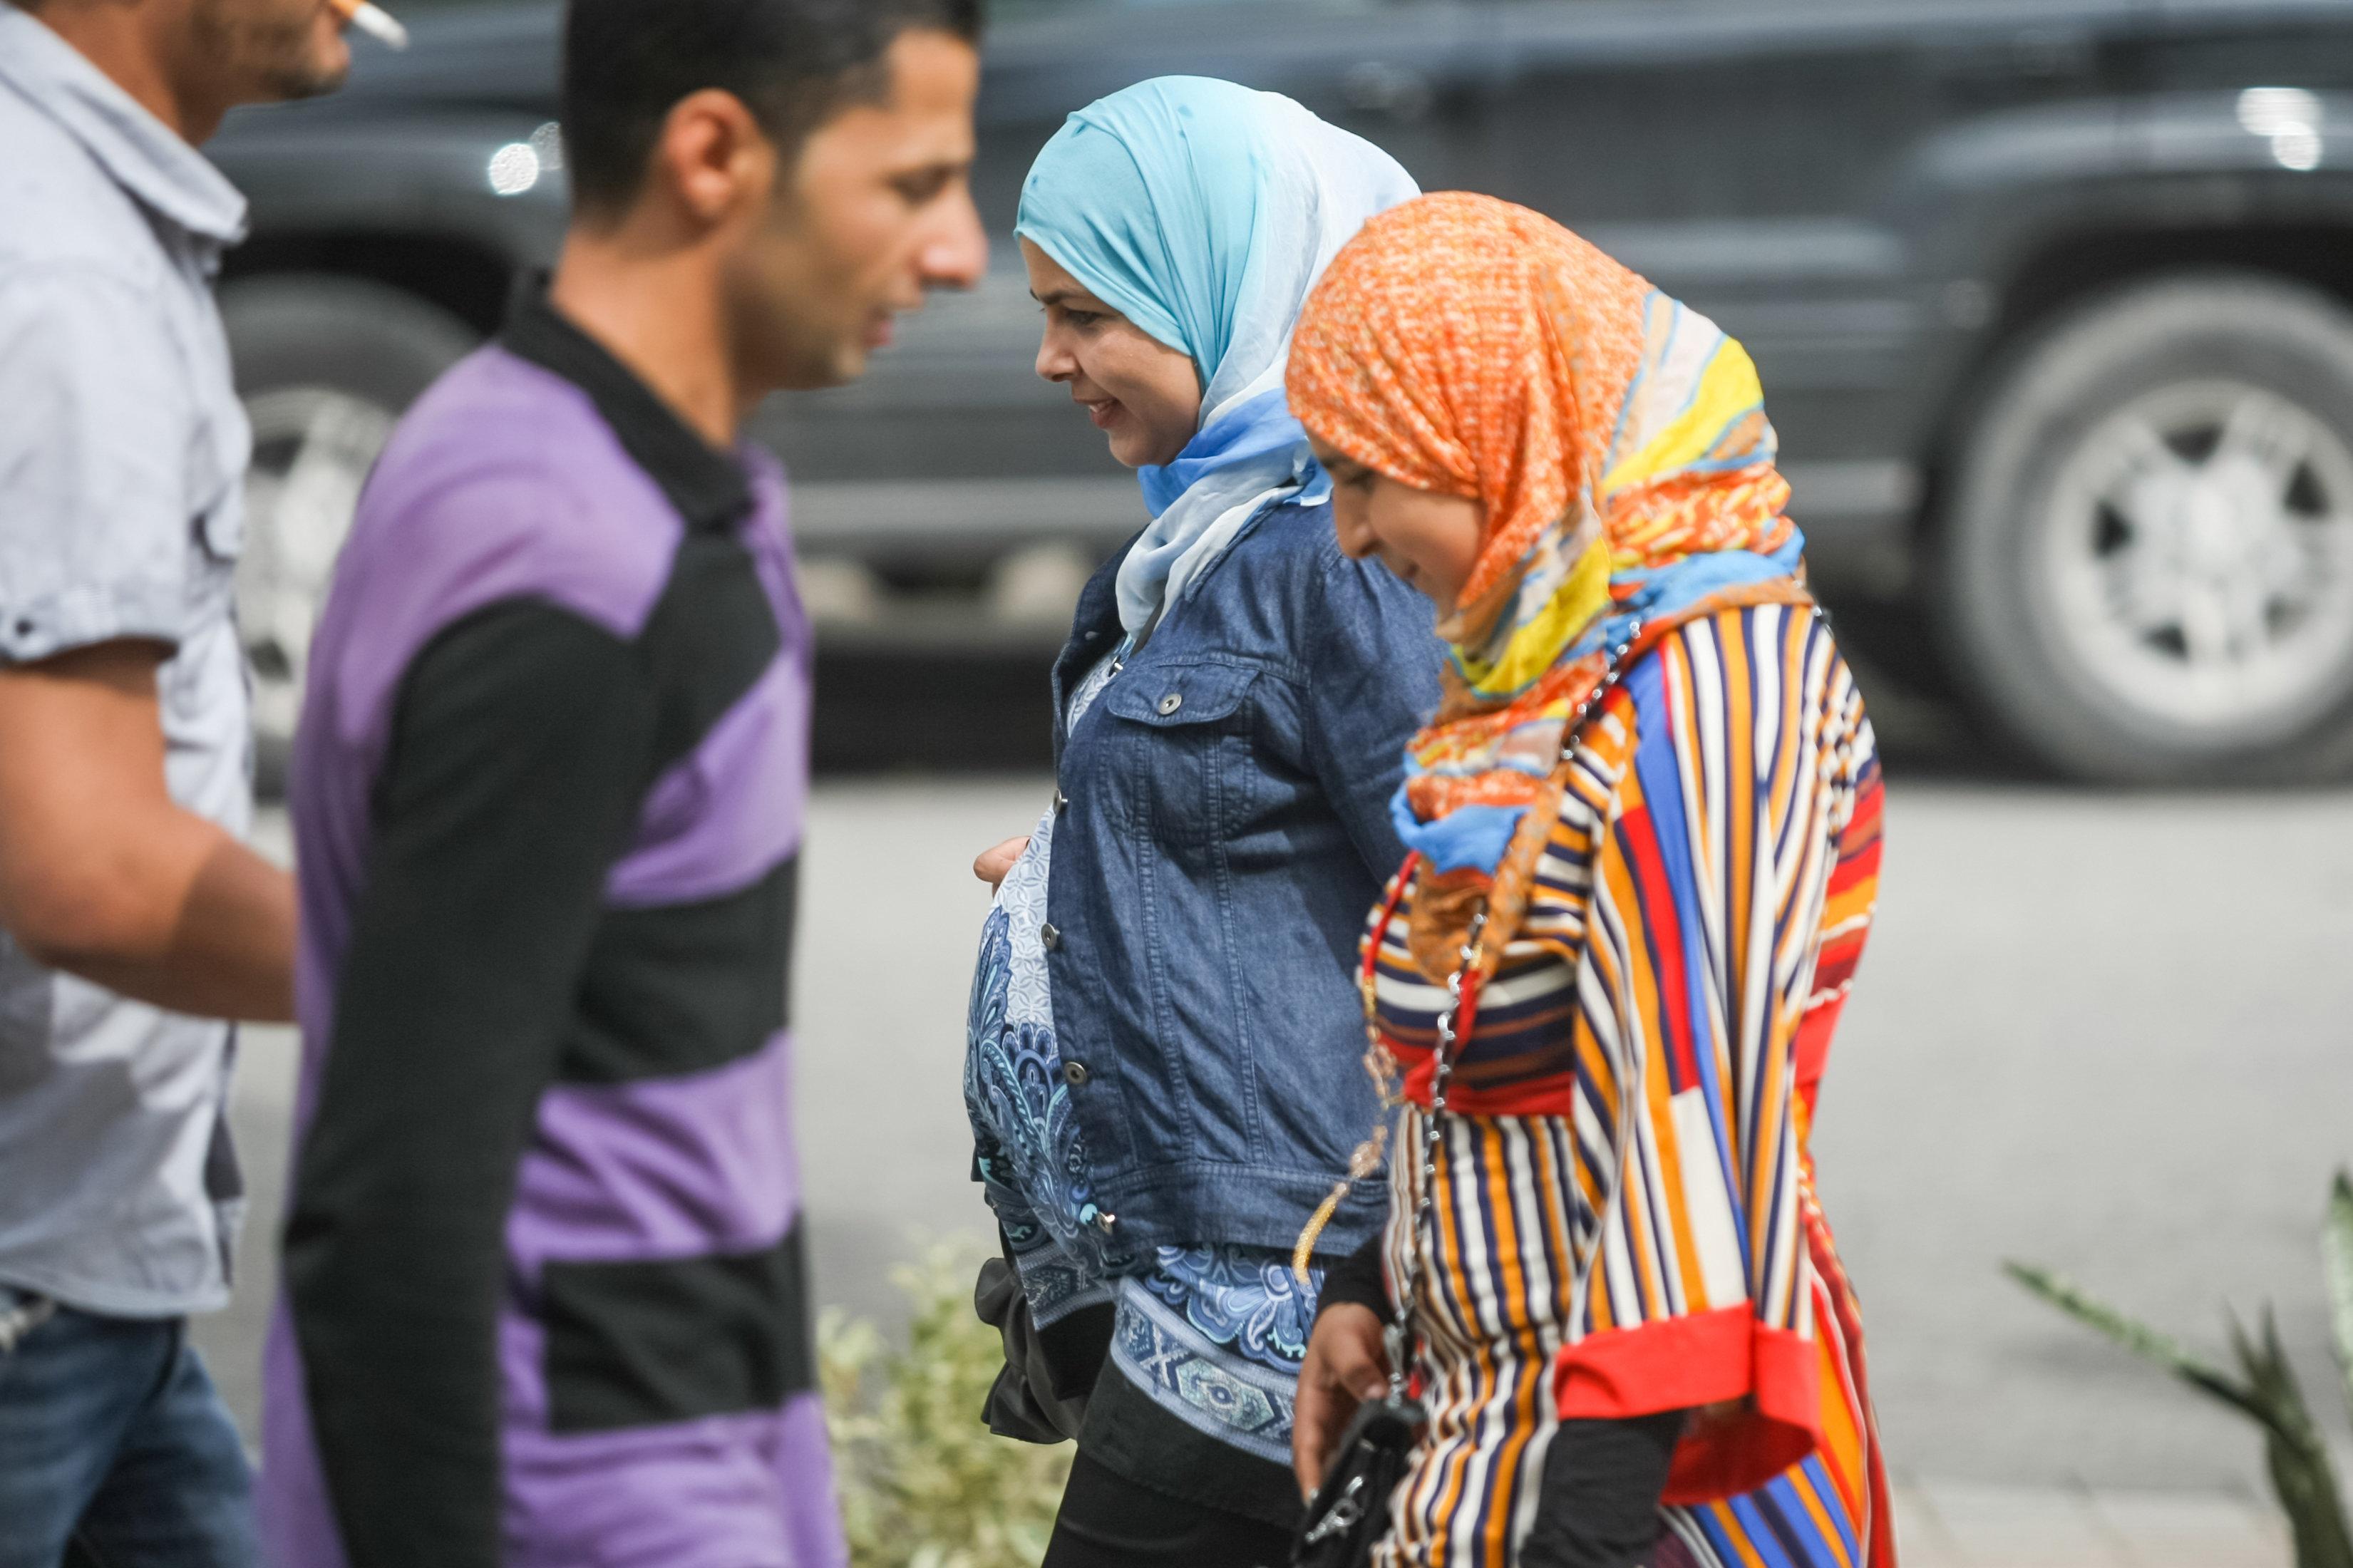 Tunisia Just Took A Big Step Forward On Muslim Women's